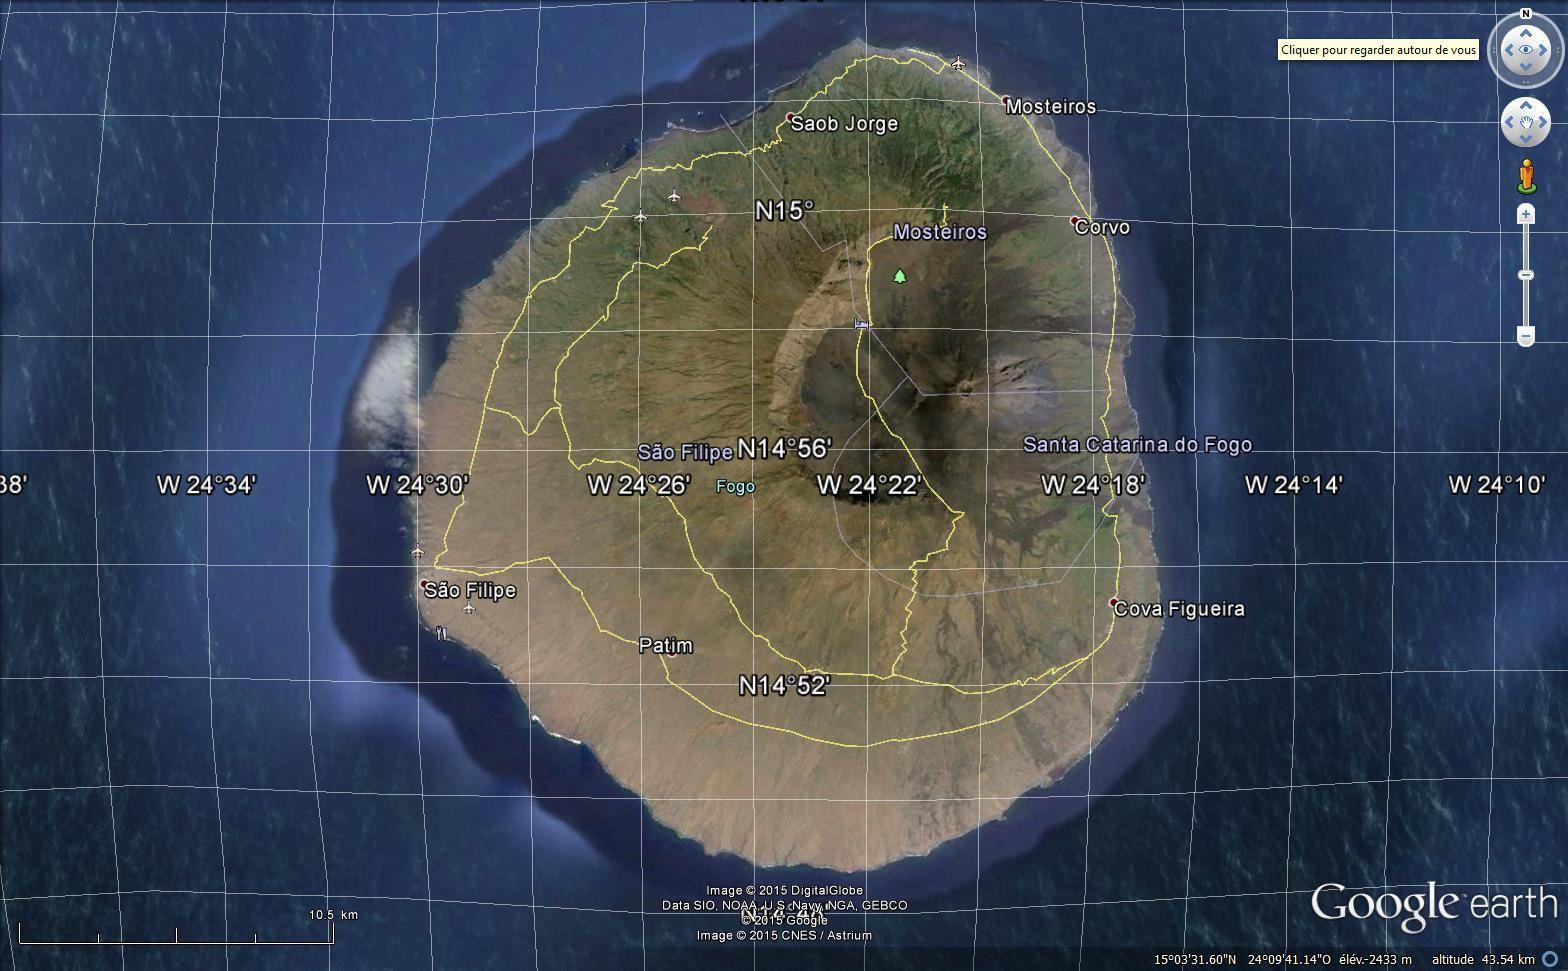 Des îles volcaniques : ici Fogo vue via Google earth